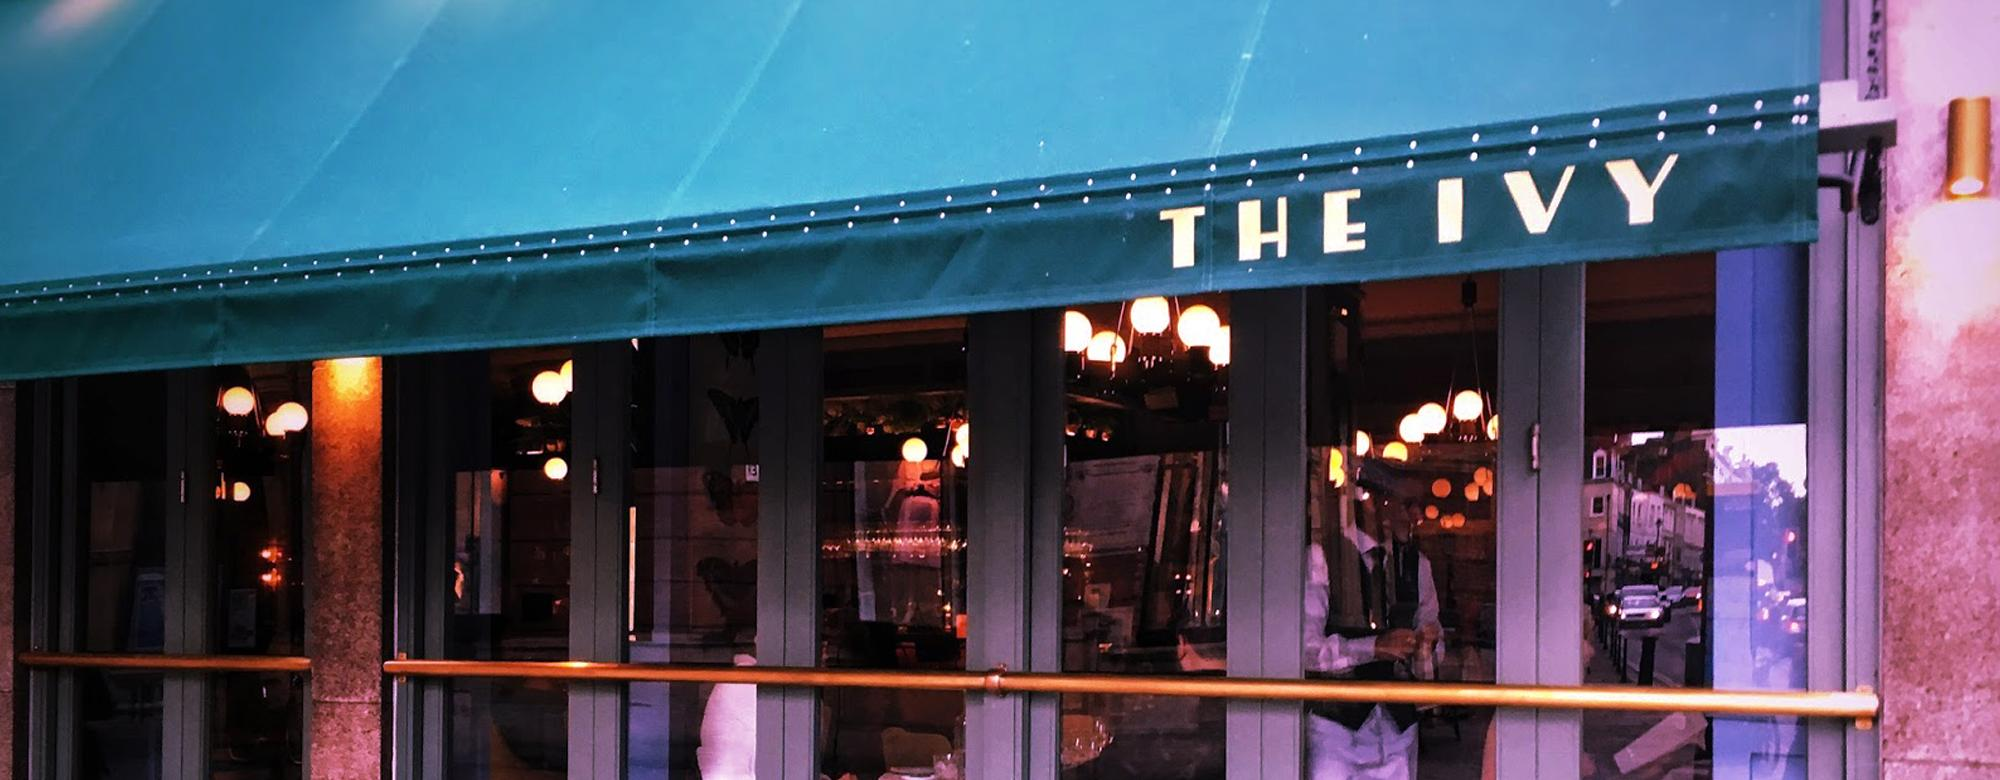 The Ivy Restaurant Exterior